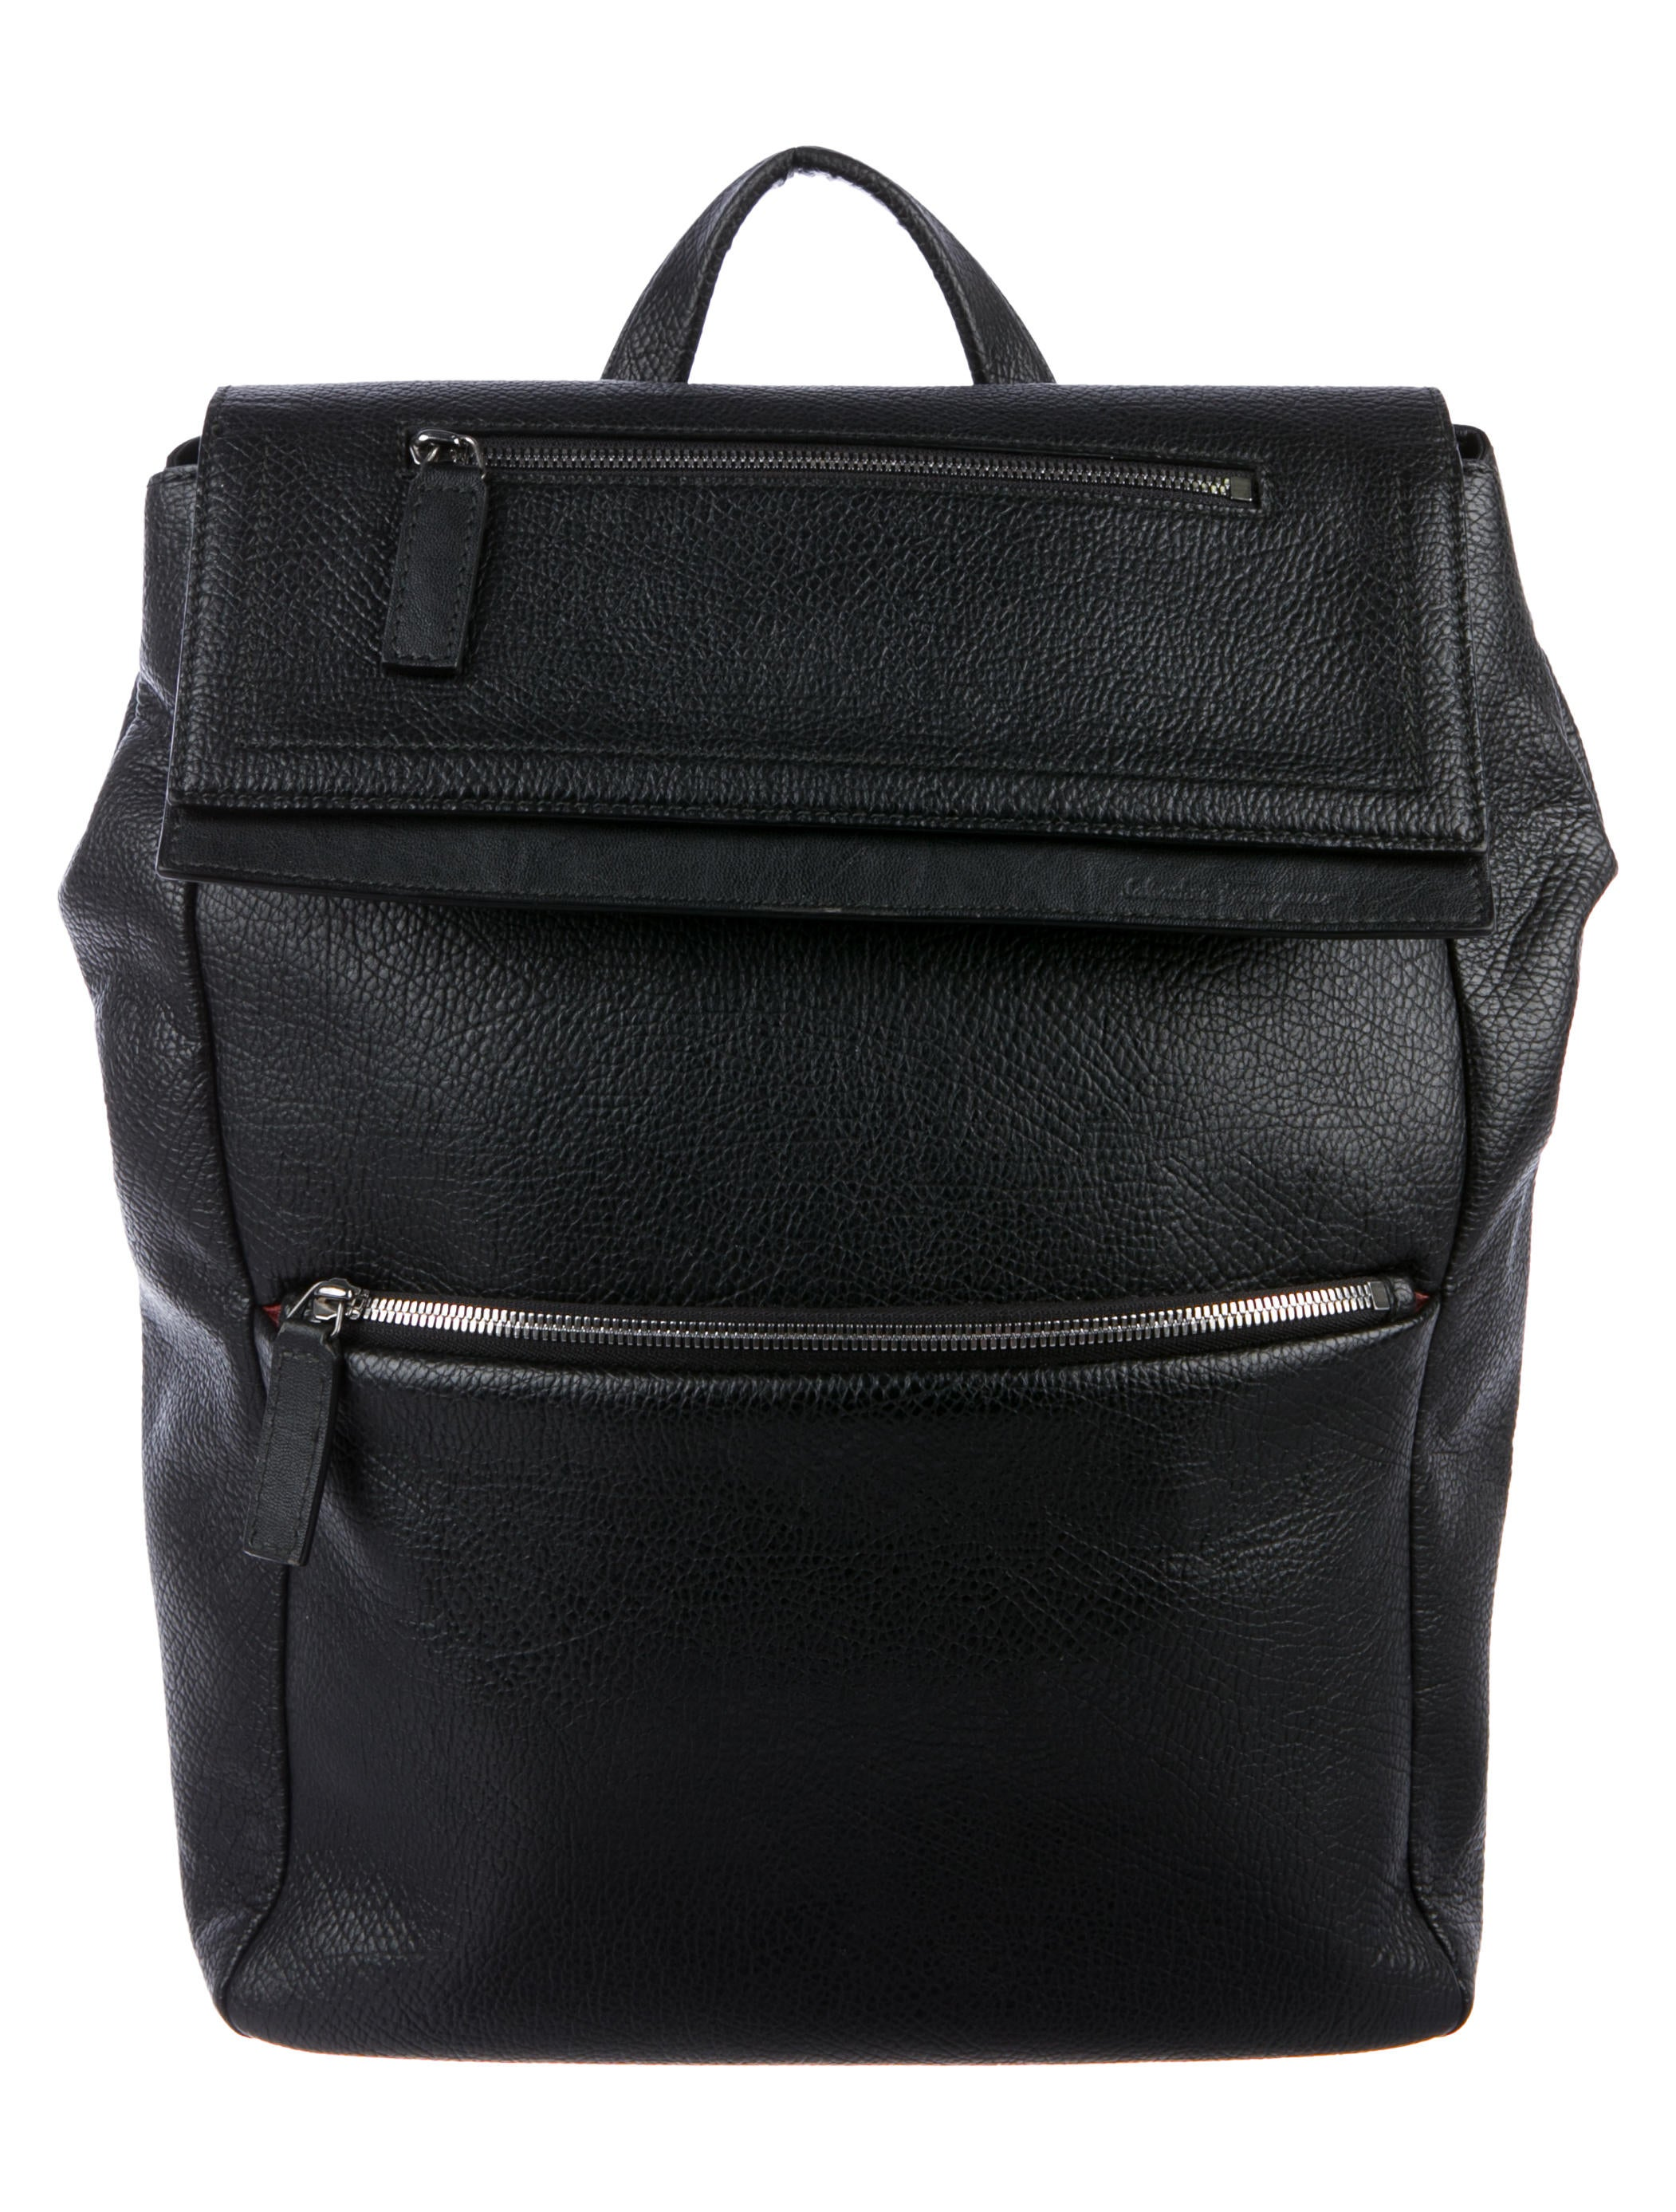 07972e67e617 Salvatore Ferragamo Grained Leather Backpack - Bags - SAL90908